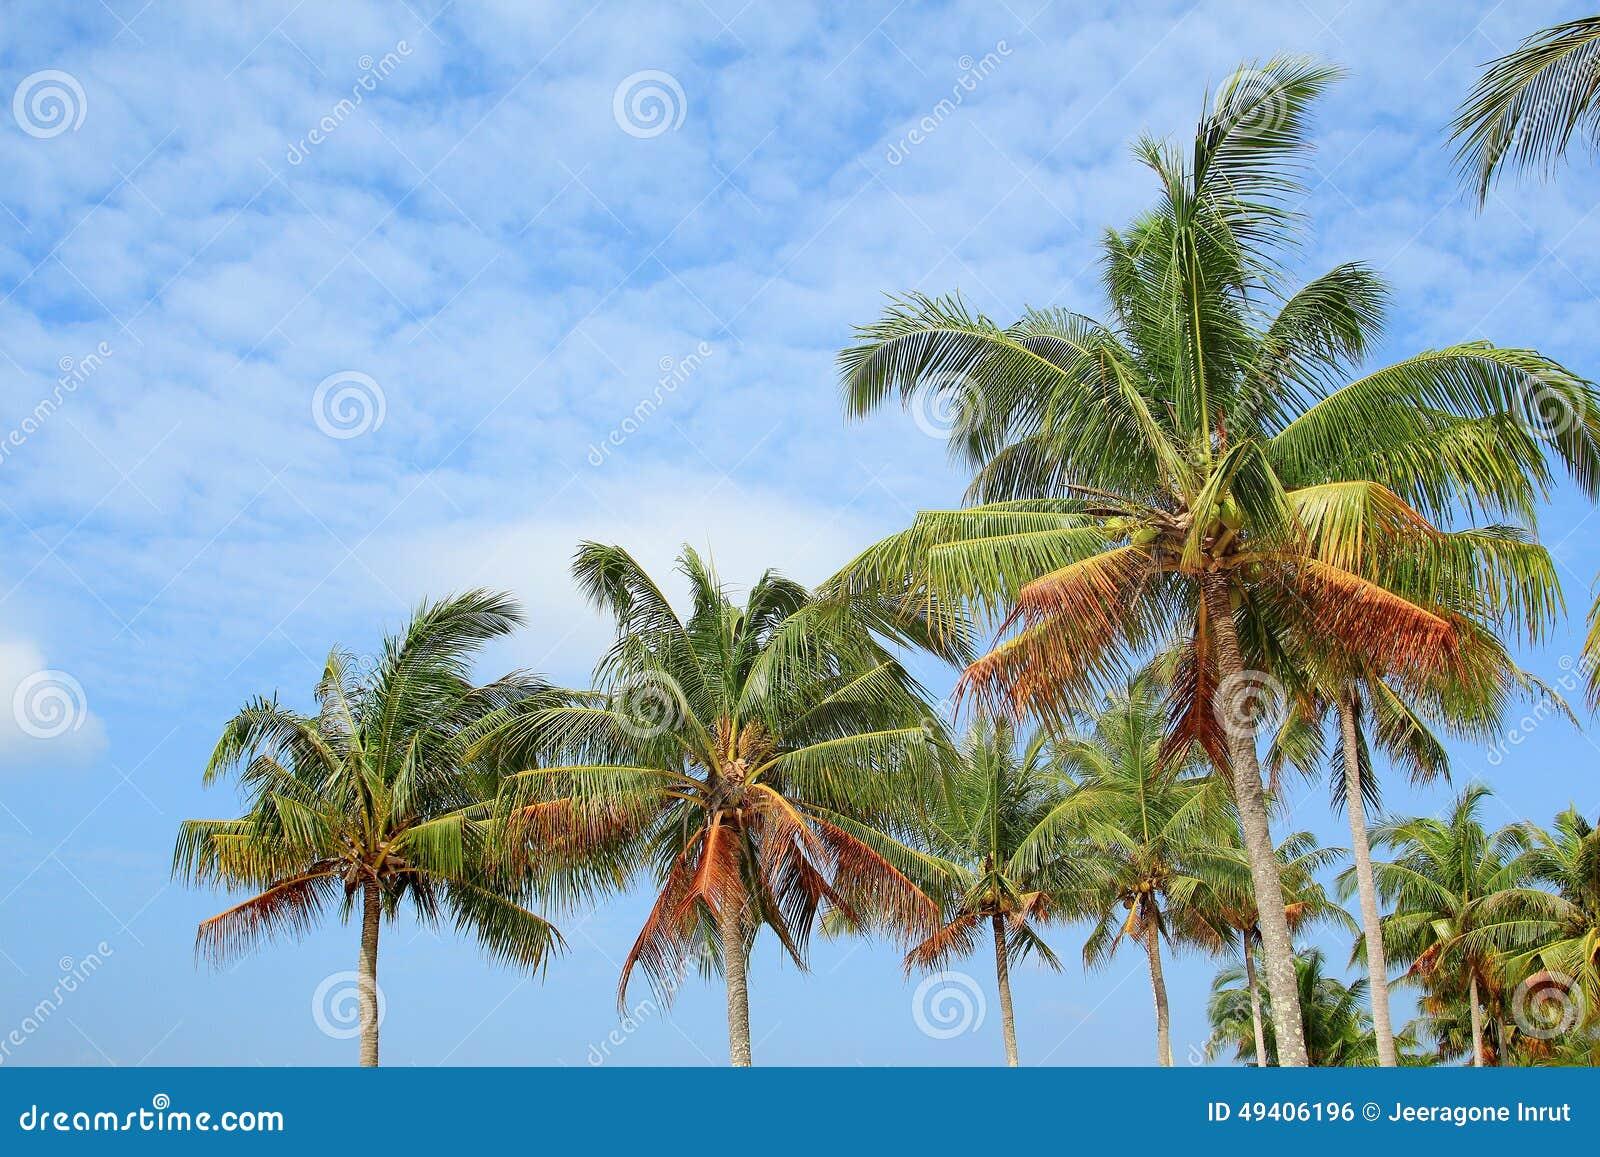 Download Kokosnussbäume stockfoto. Bild von outdoor, küste, blau - 49406196